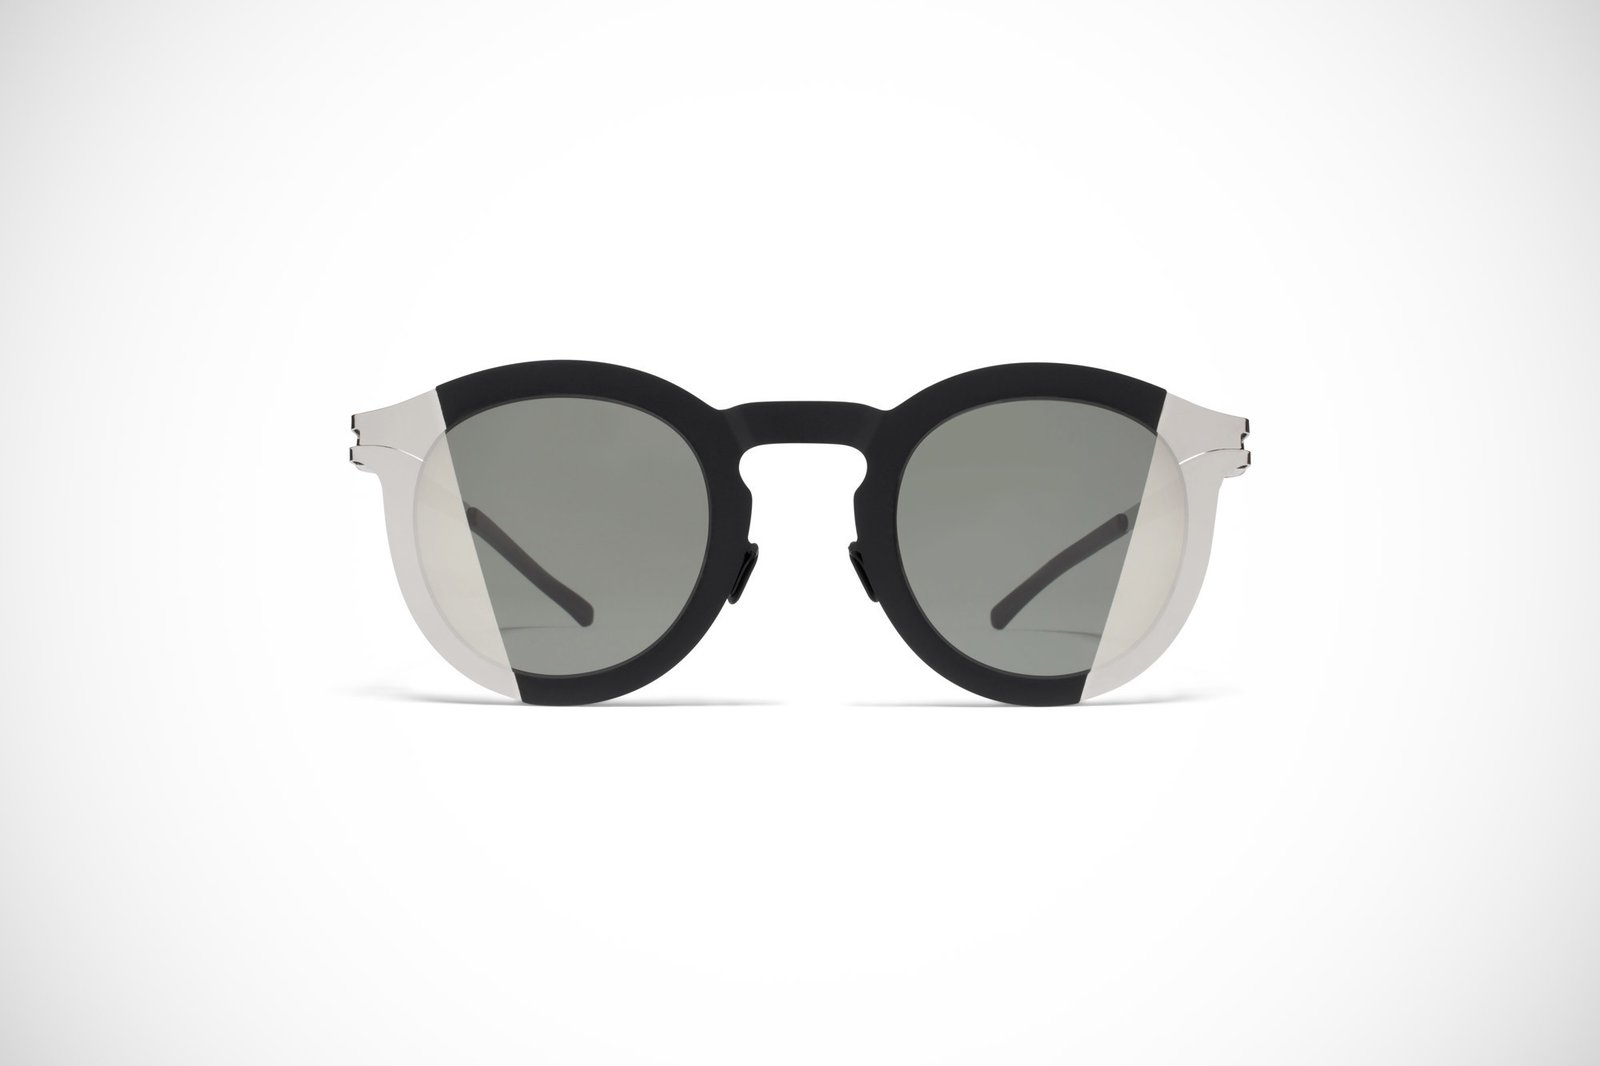 Photo 5 of 6 in Mykita Studio Eyewear Collection